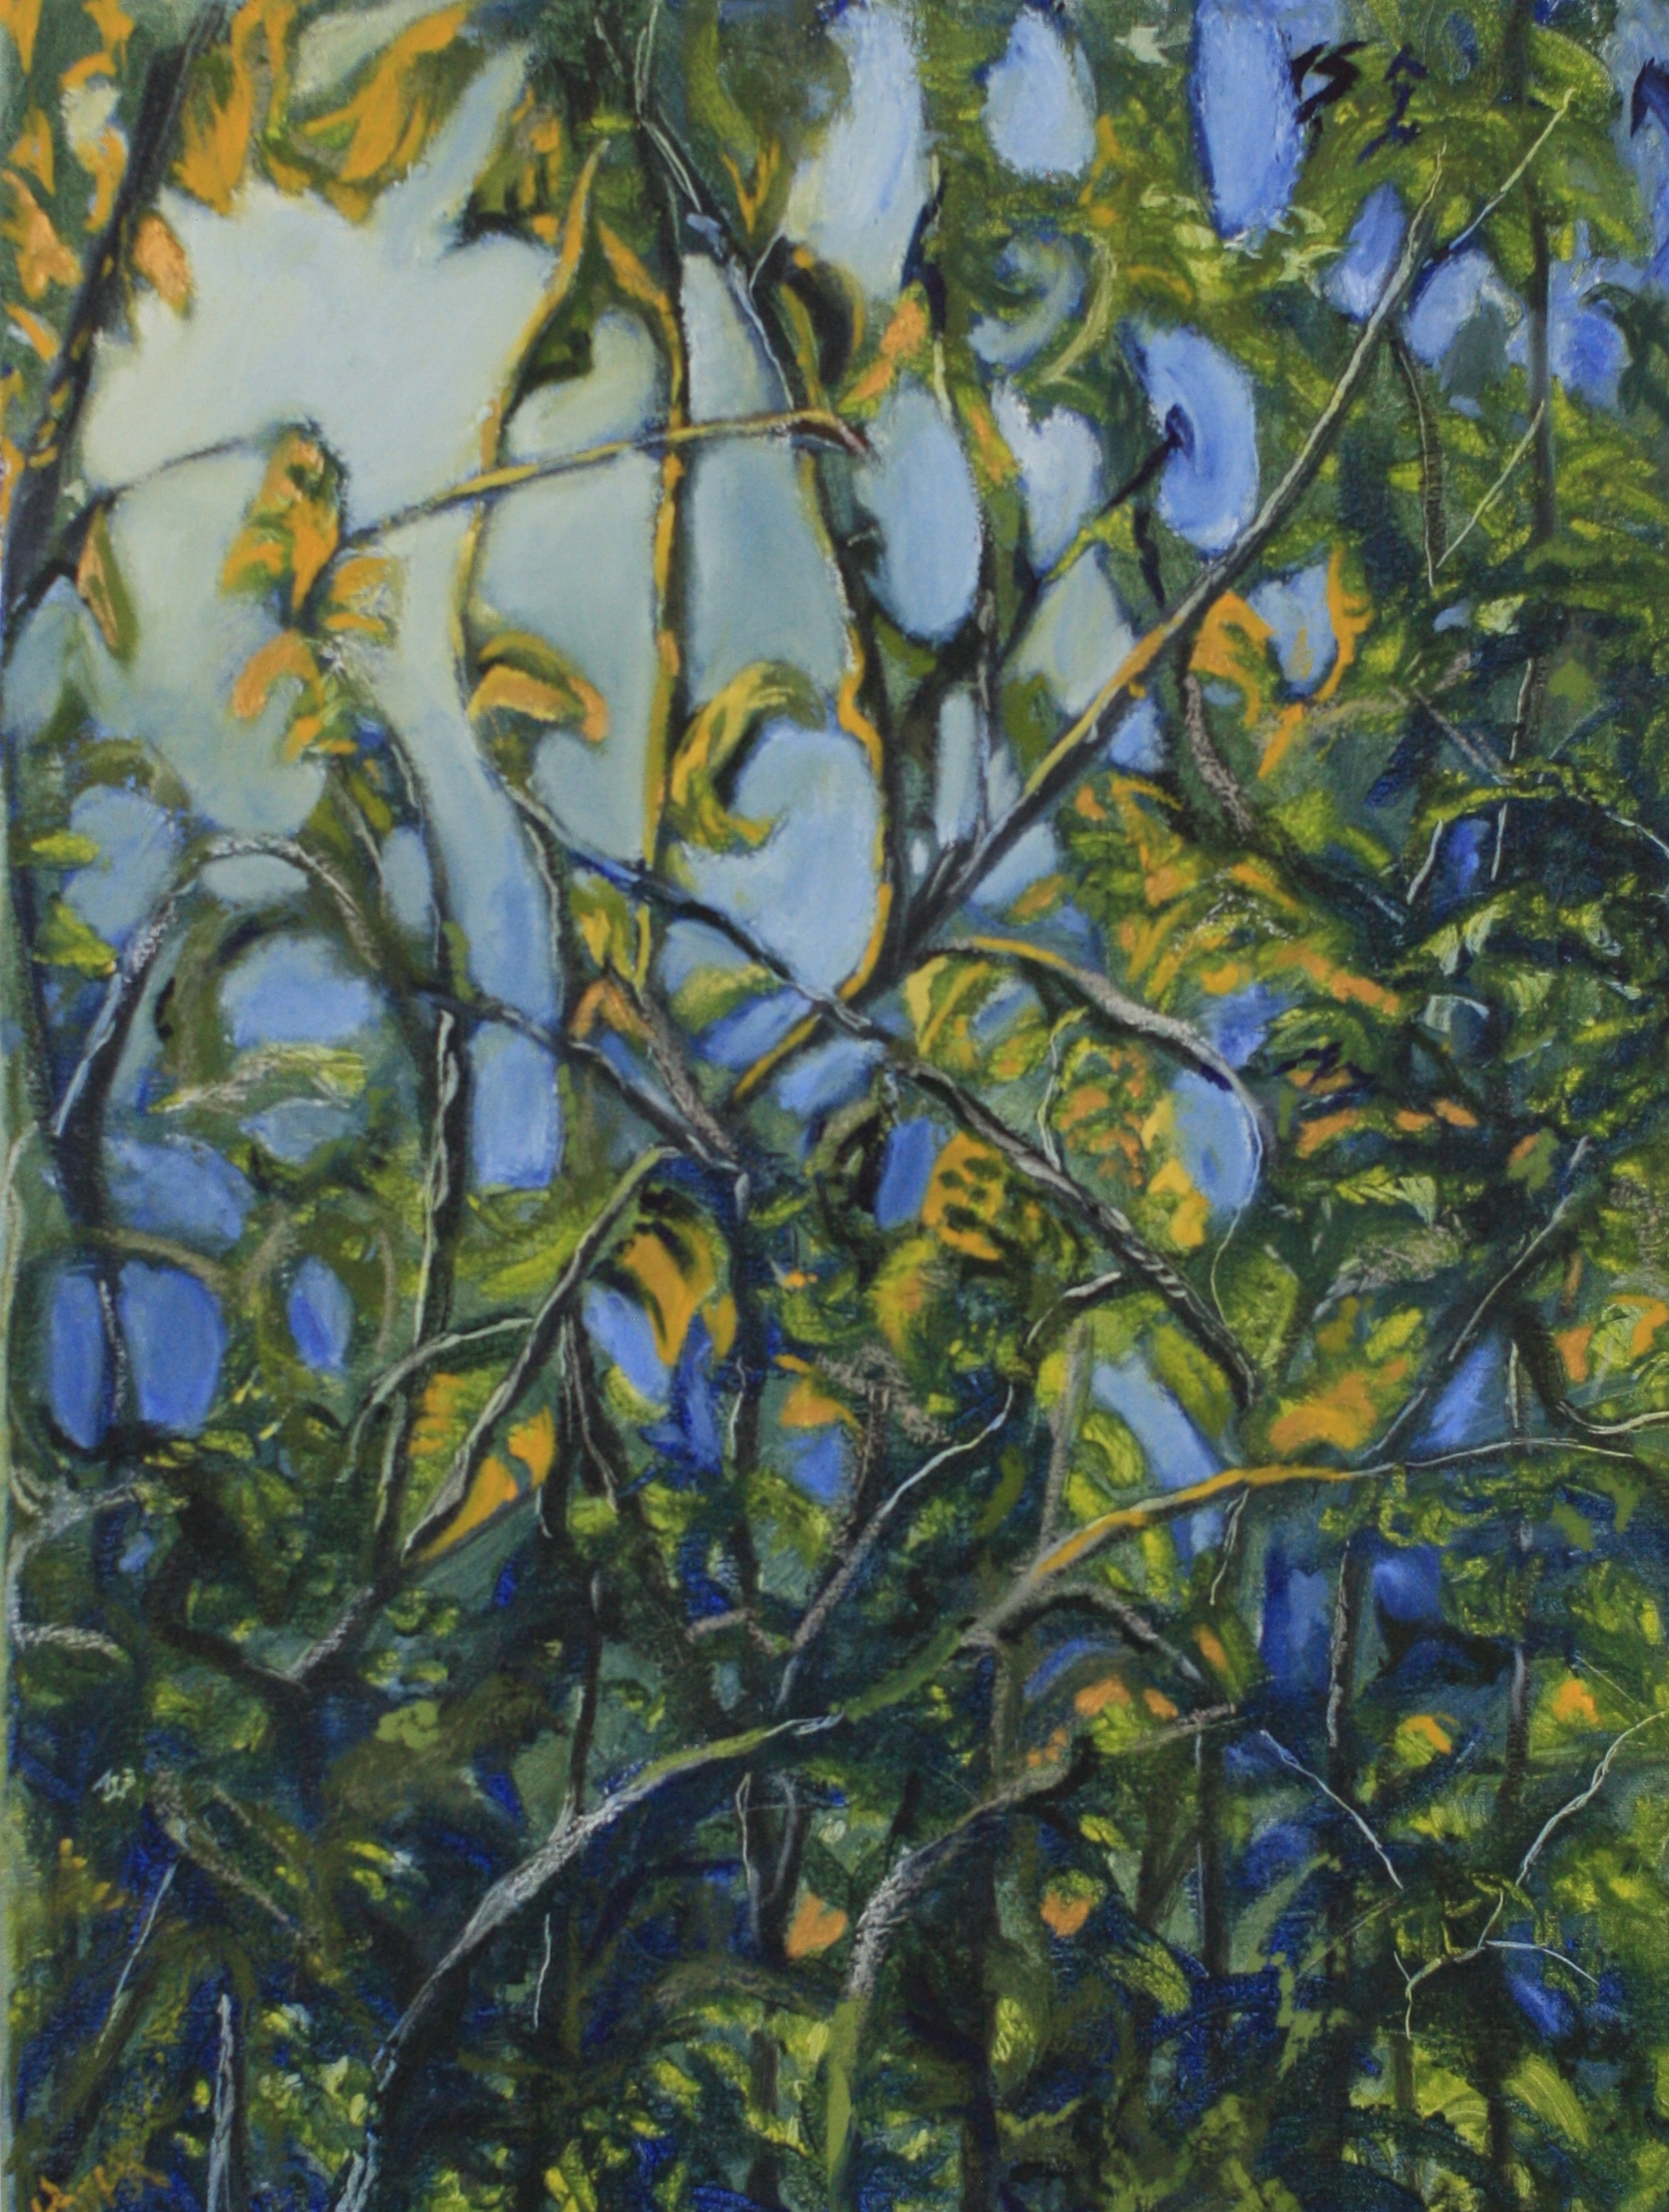 Lynn Valley, B.C. - Oil on Canvass.  2.5'x3.3' $1000